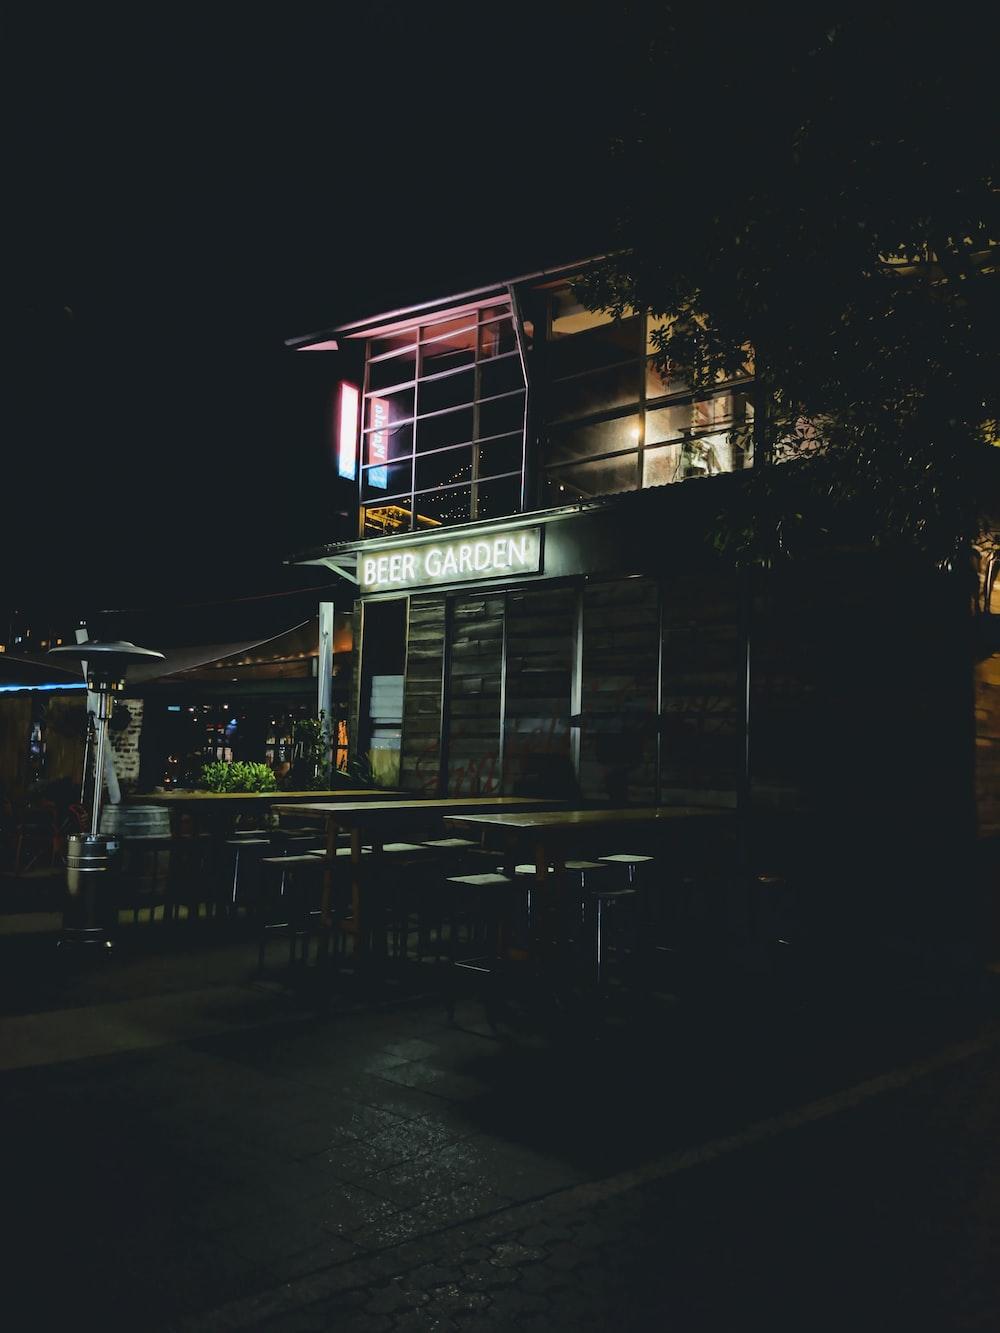 2-storey building during nighttime